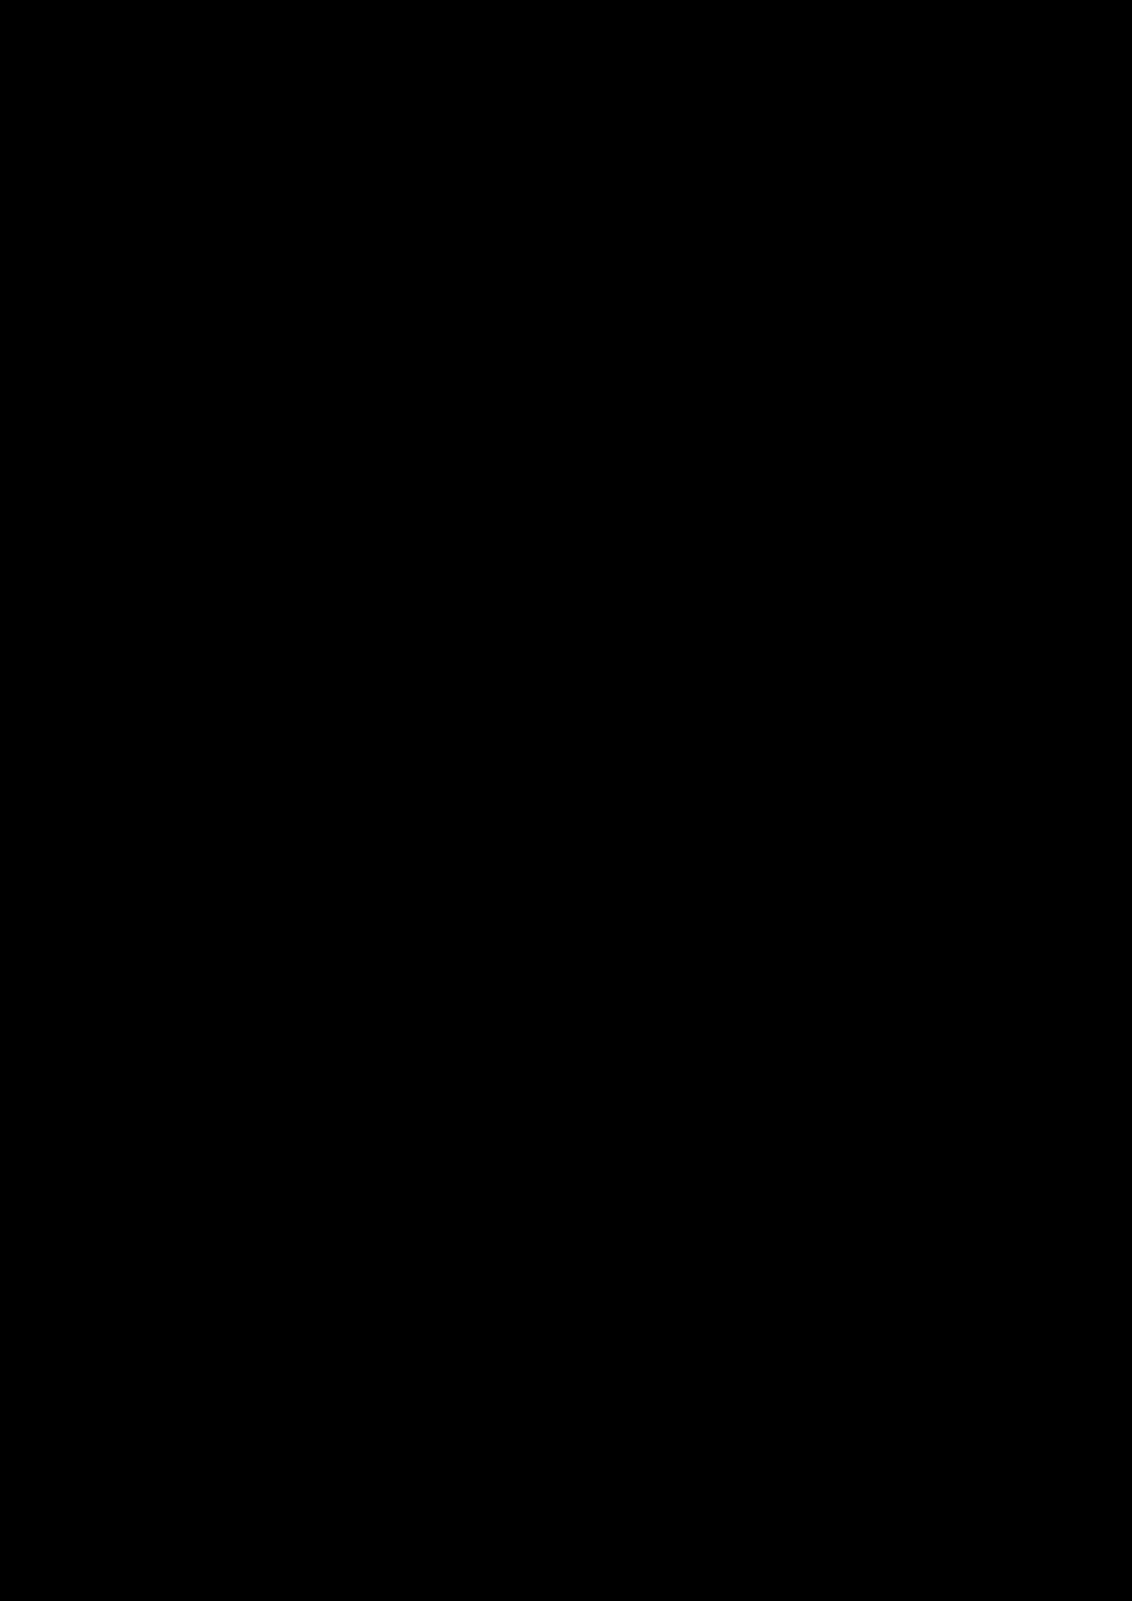 Belyiy sokol slide, Image 180